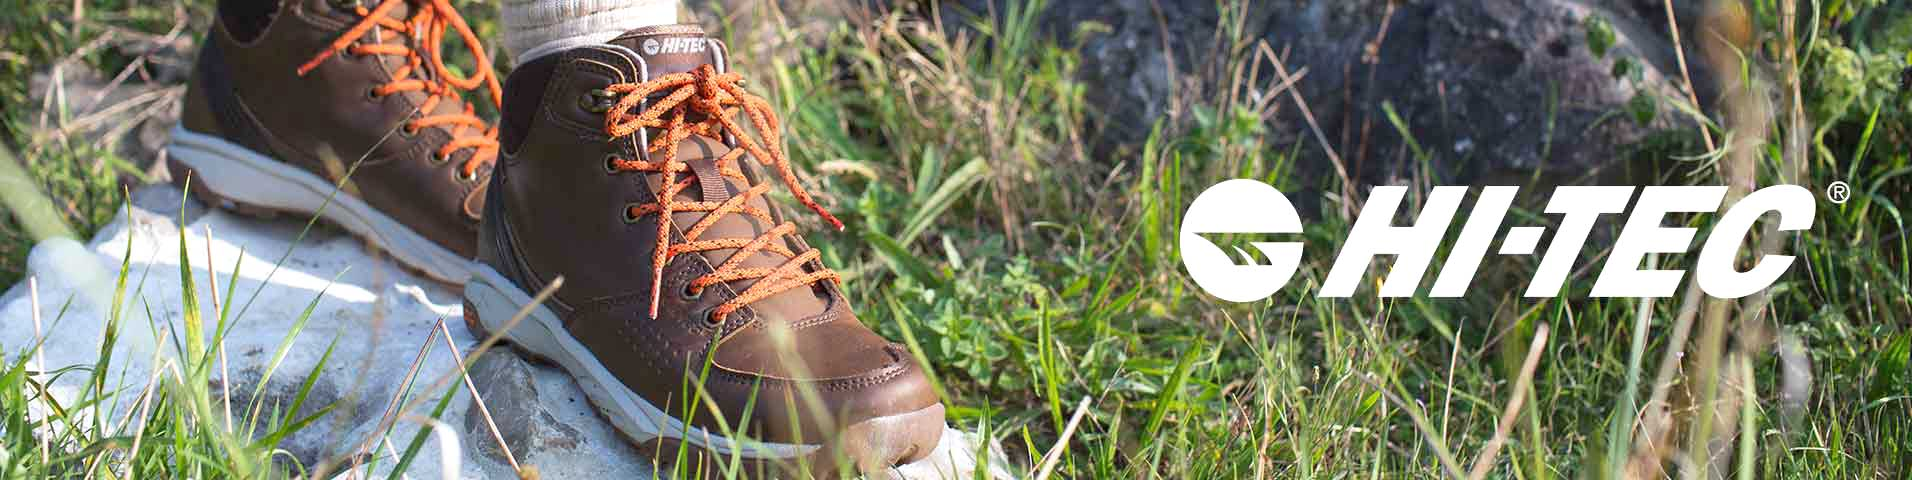 Scarpe donna Hi Tec | Grande assortimento di calzature su